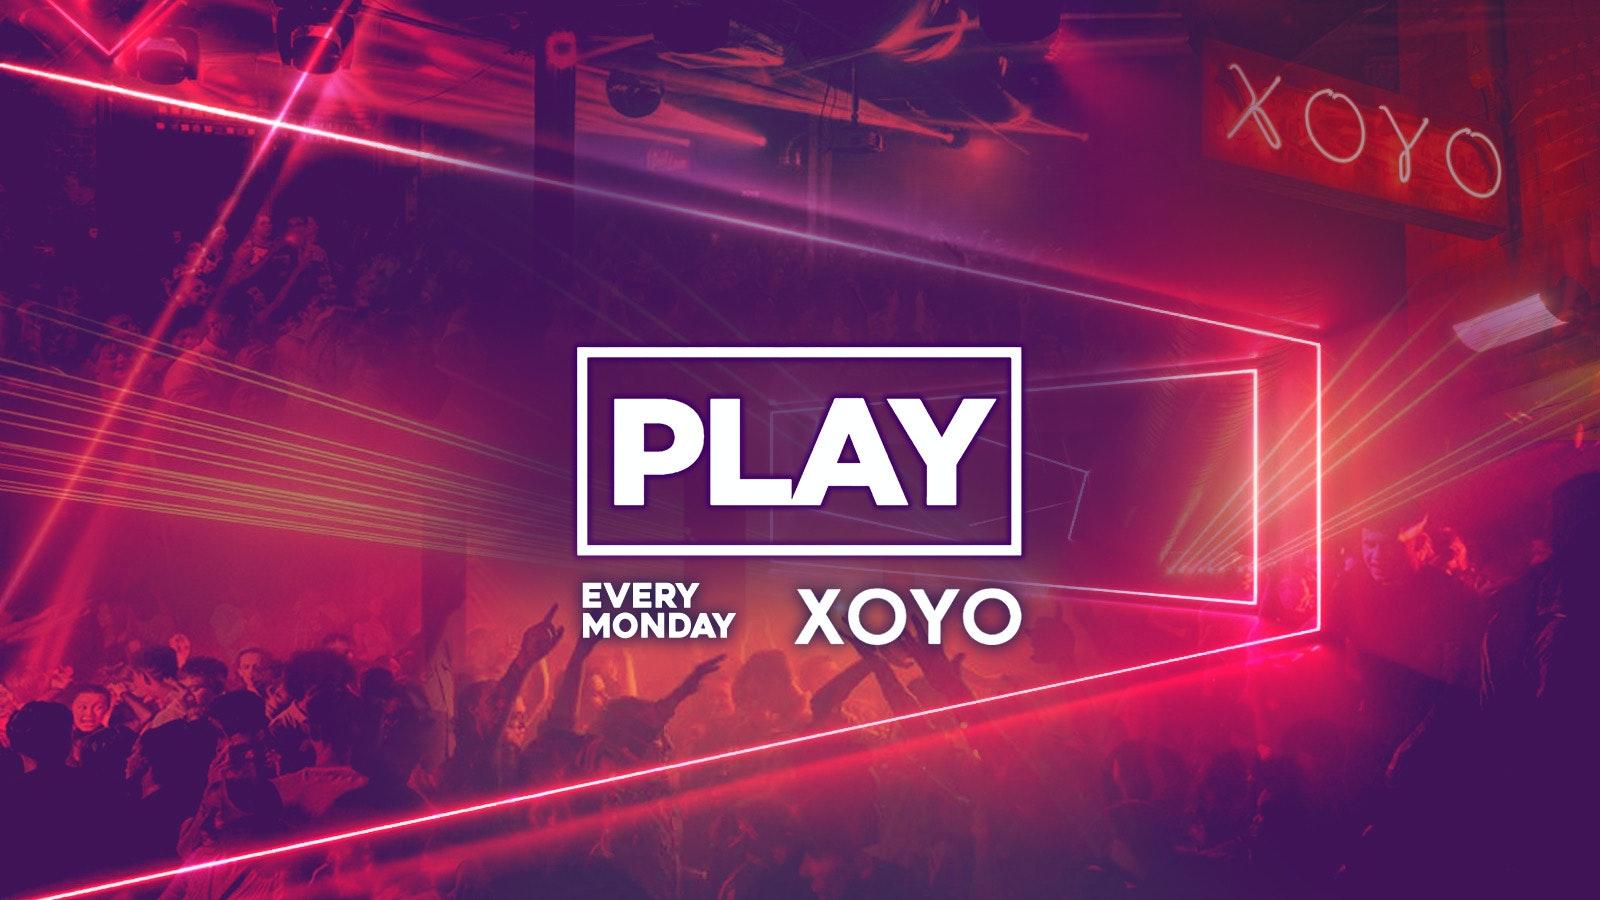 Play London Every Monday at XOYO!